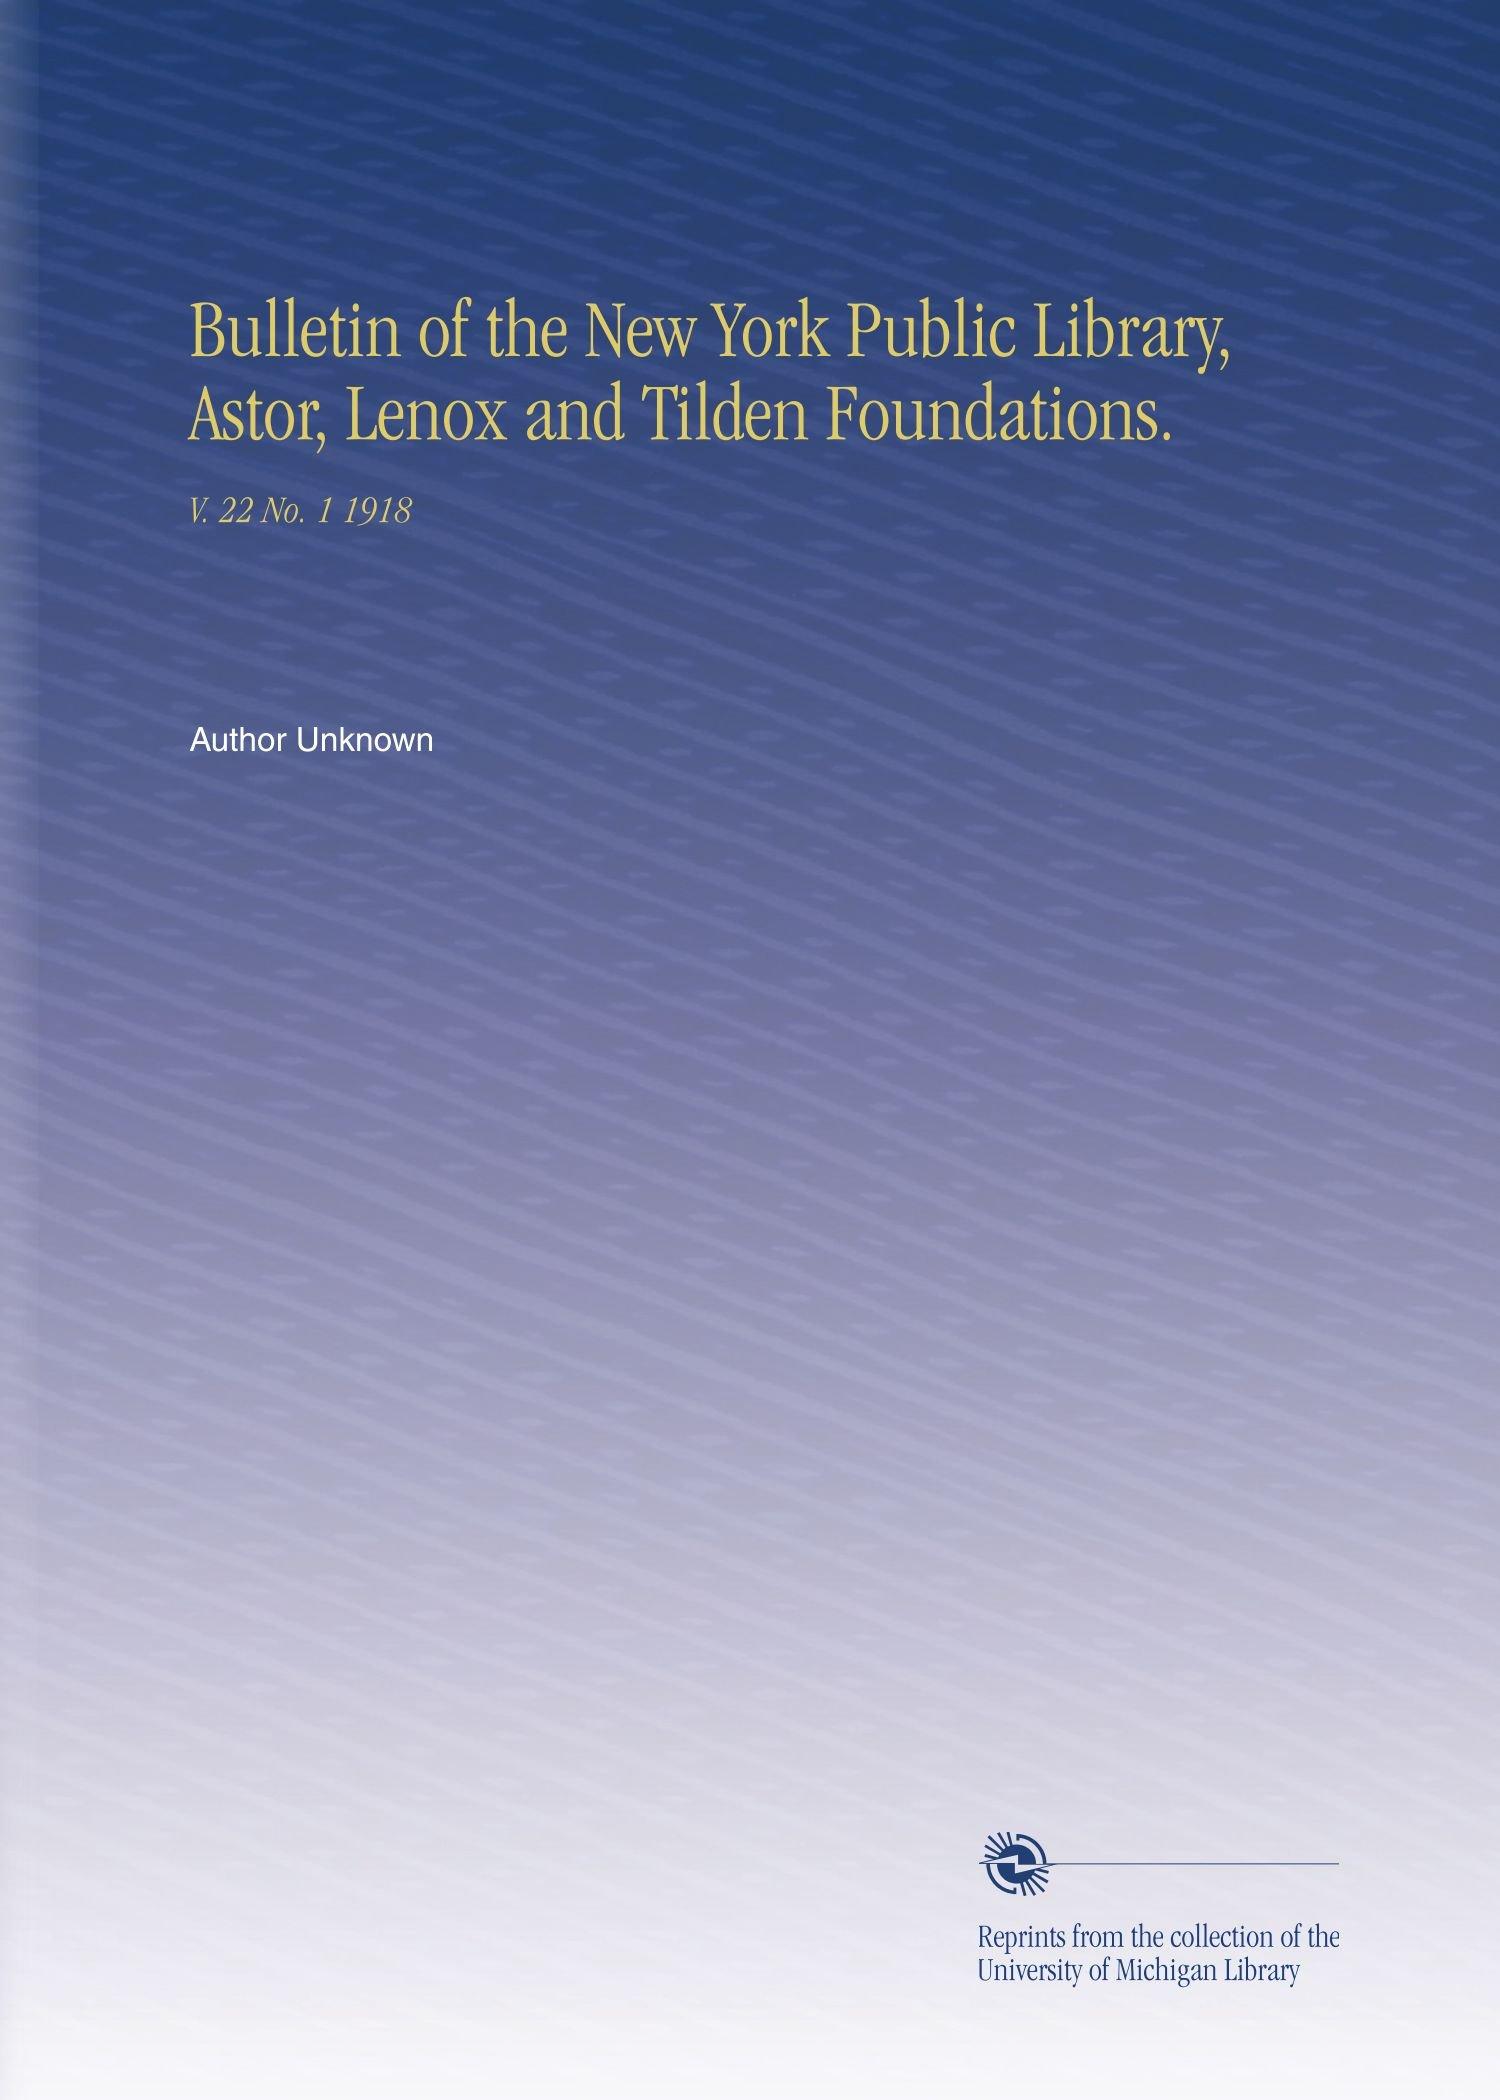 Bulletin of the New York Public Library, Astor, Lenox and Tilden Foundations.: V. 22 No. 1 1918 pdf epub